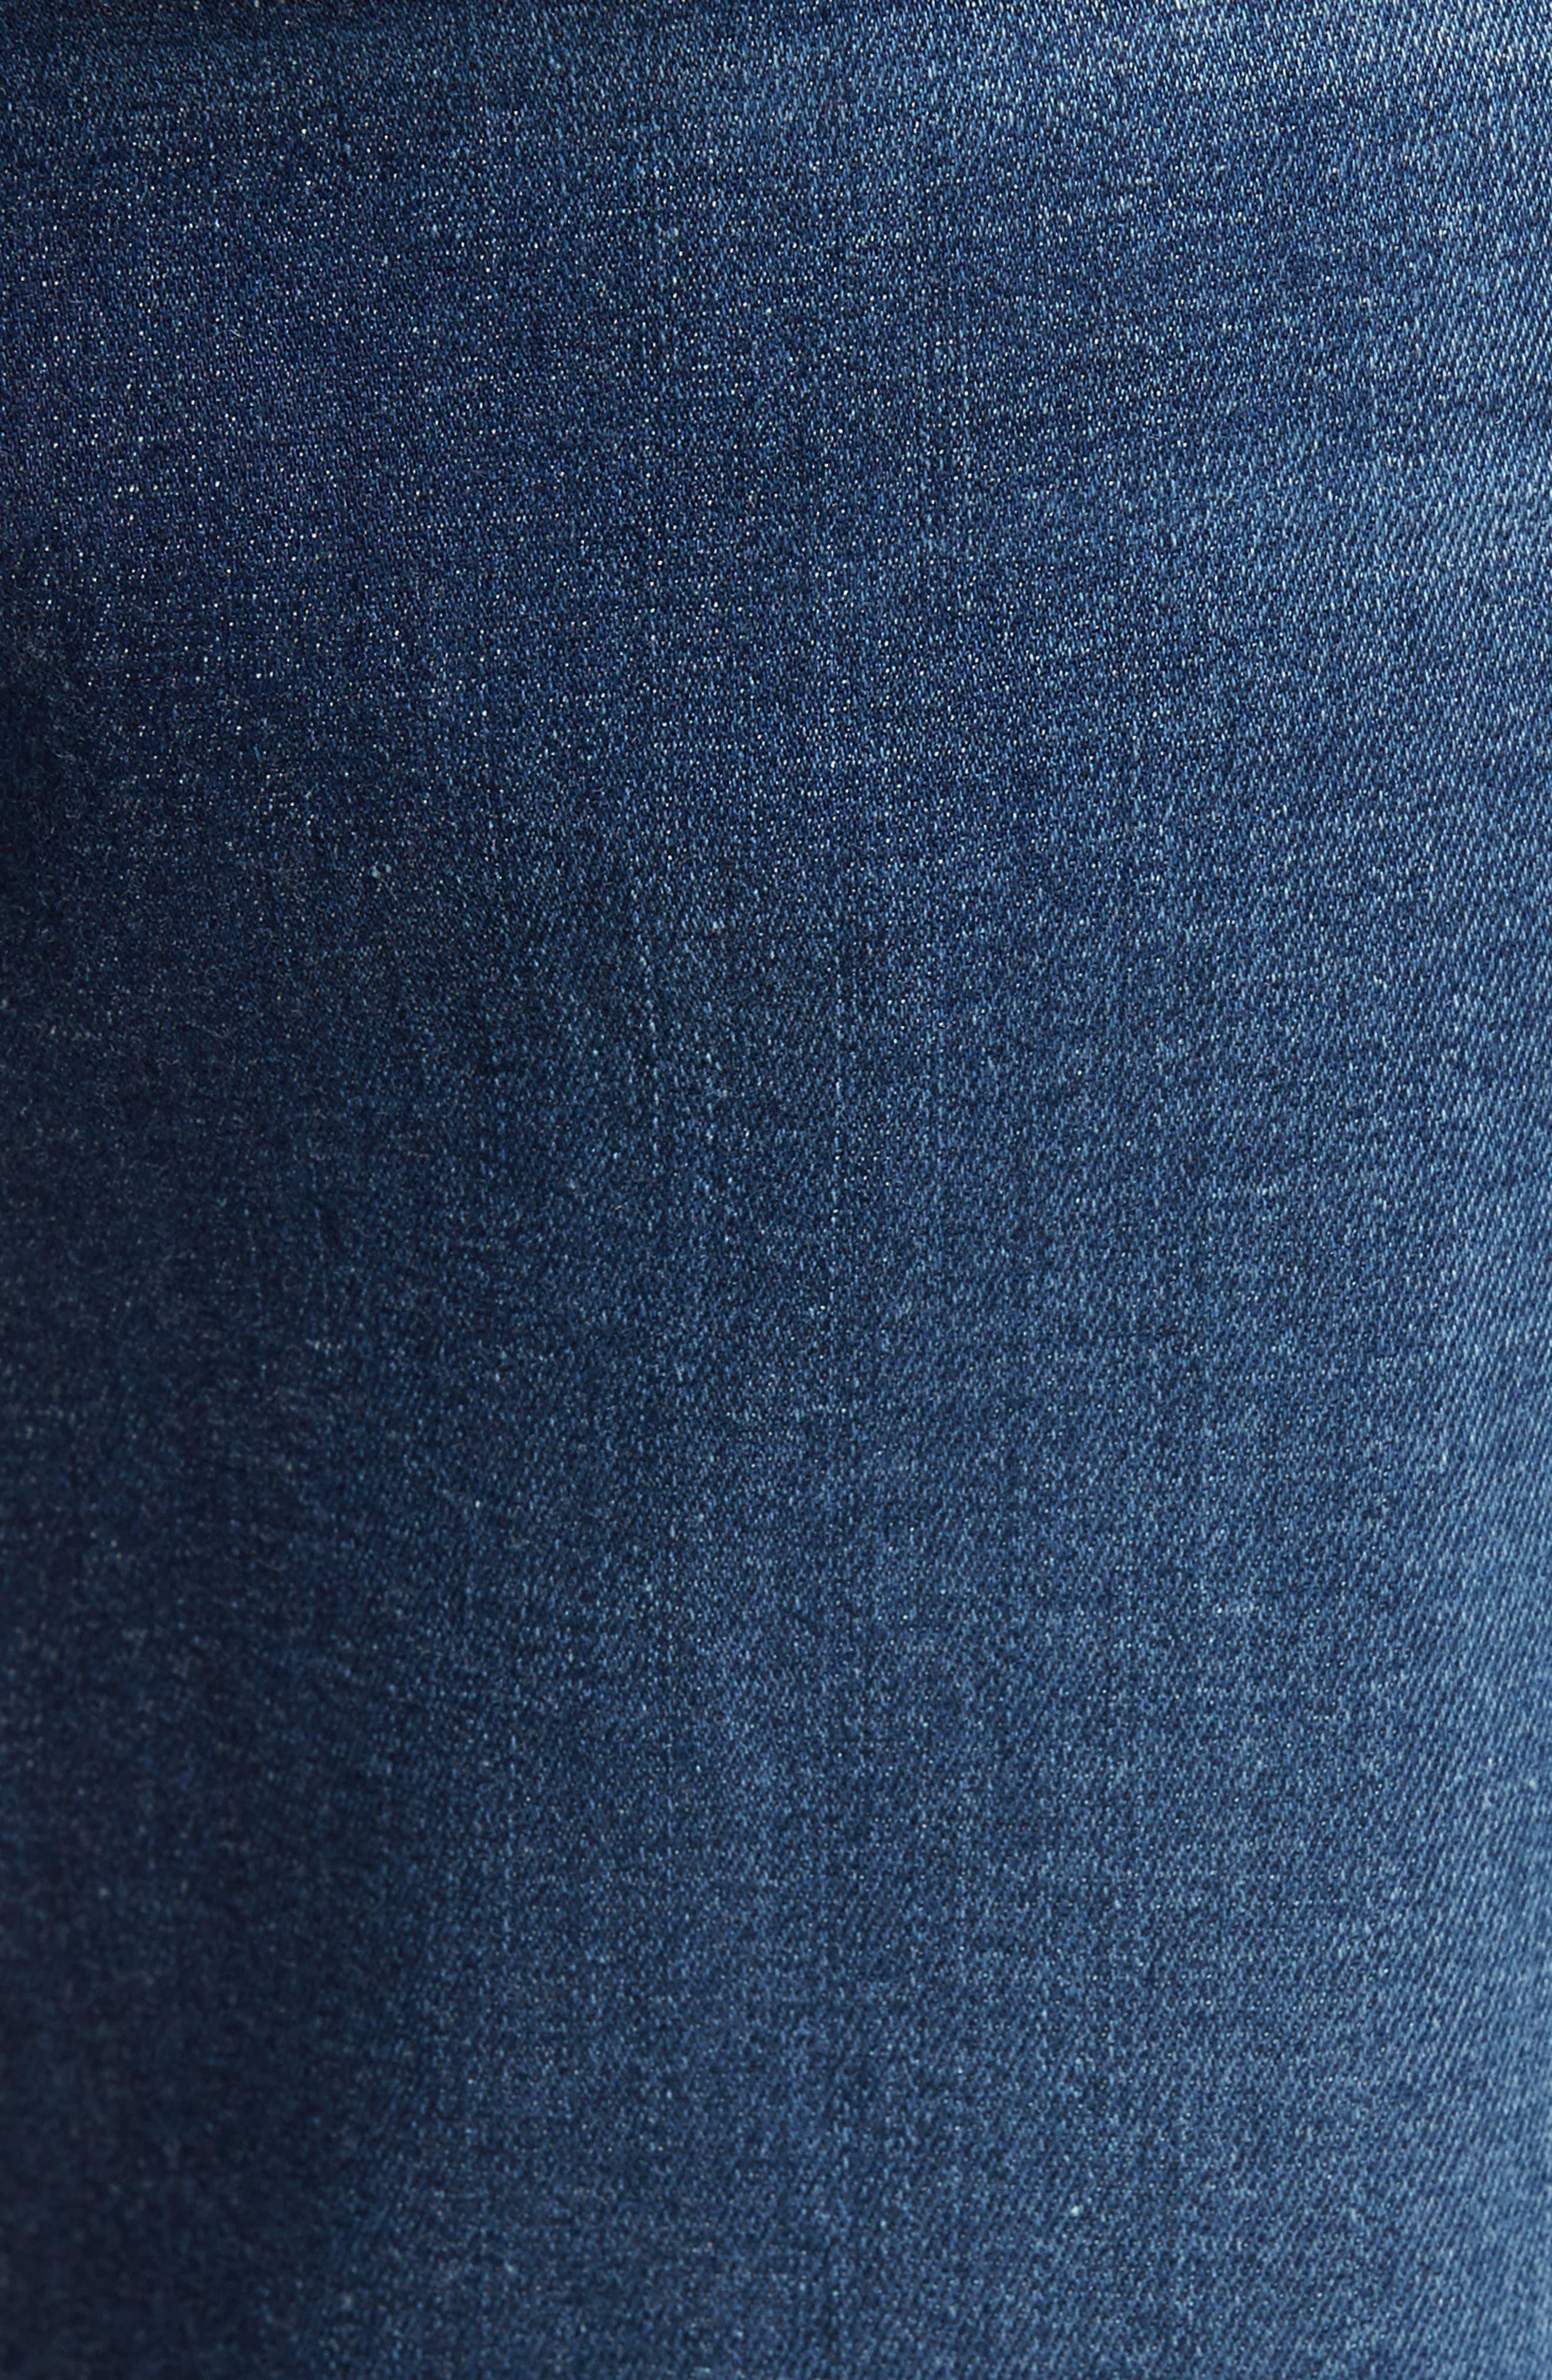 Alternate Image 5  - 7 For All Mankind® Slimmy Slim Fit Jeans (MOMT-Momentum)